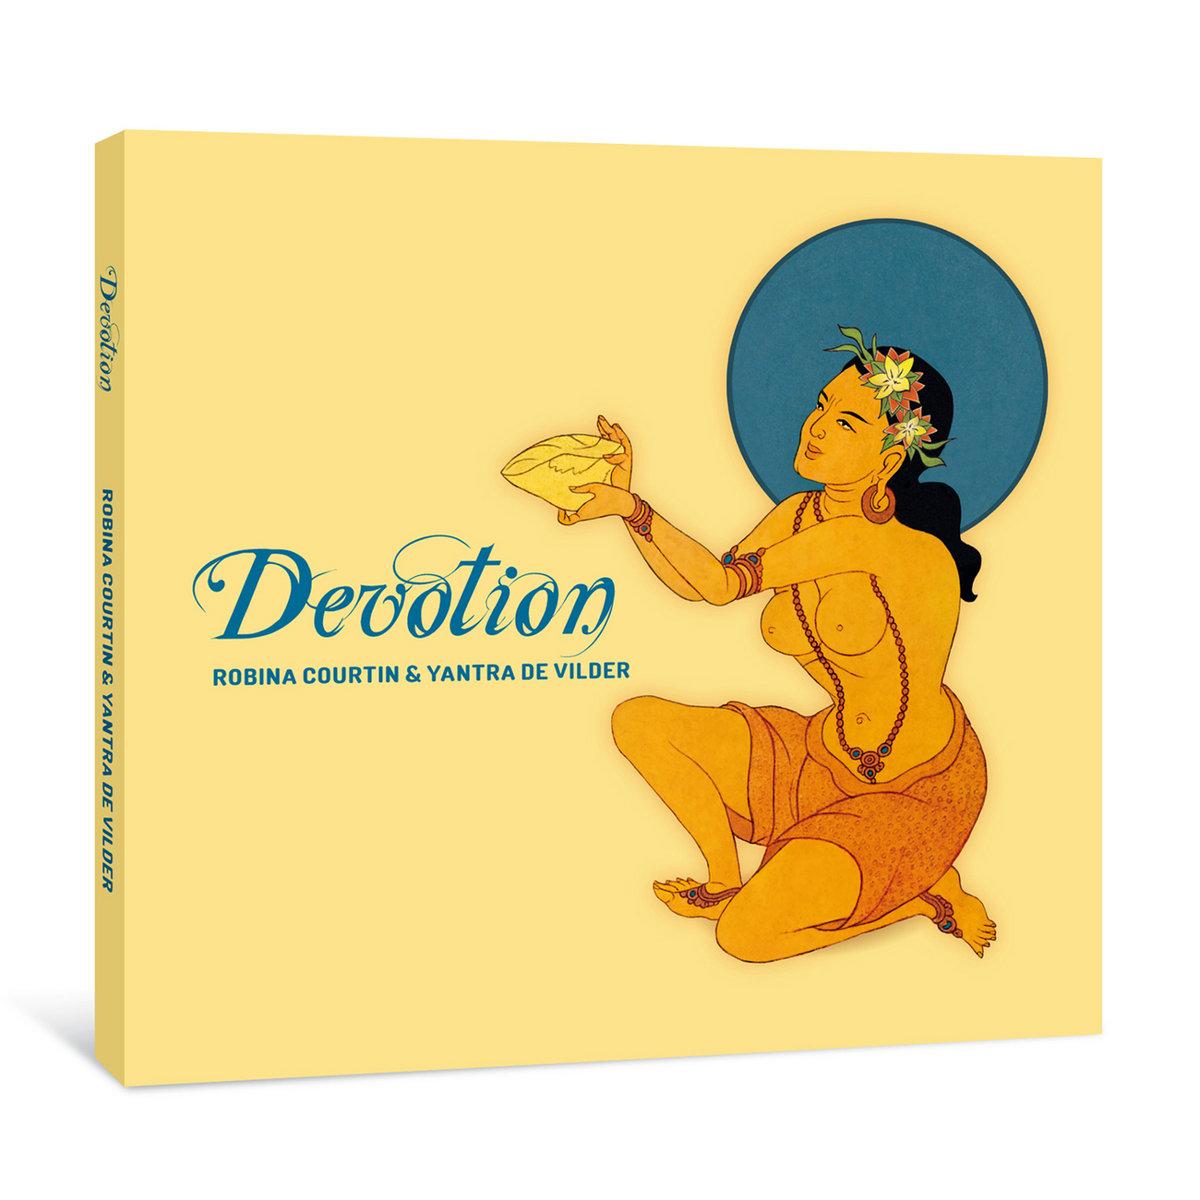 Devotion | robina courtin & yantra de vilder.